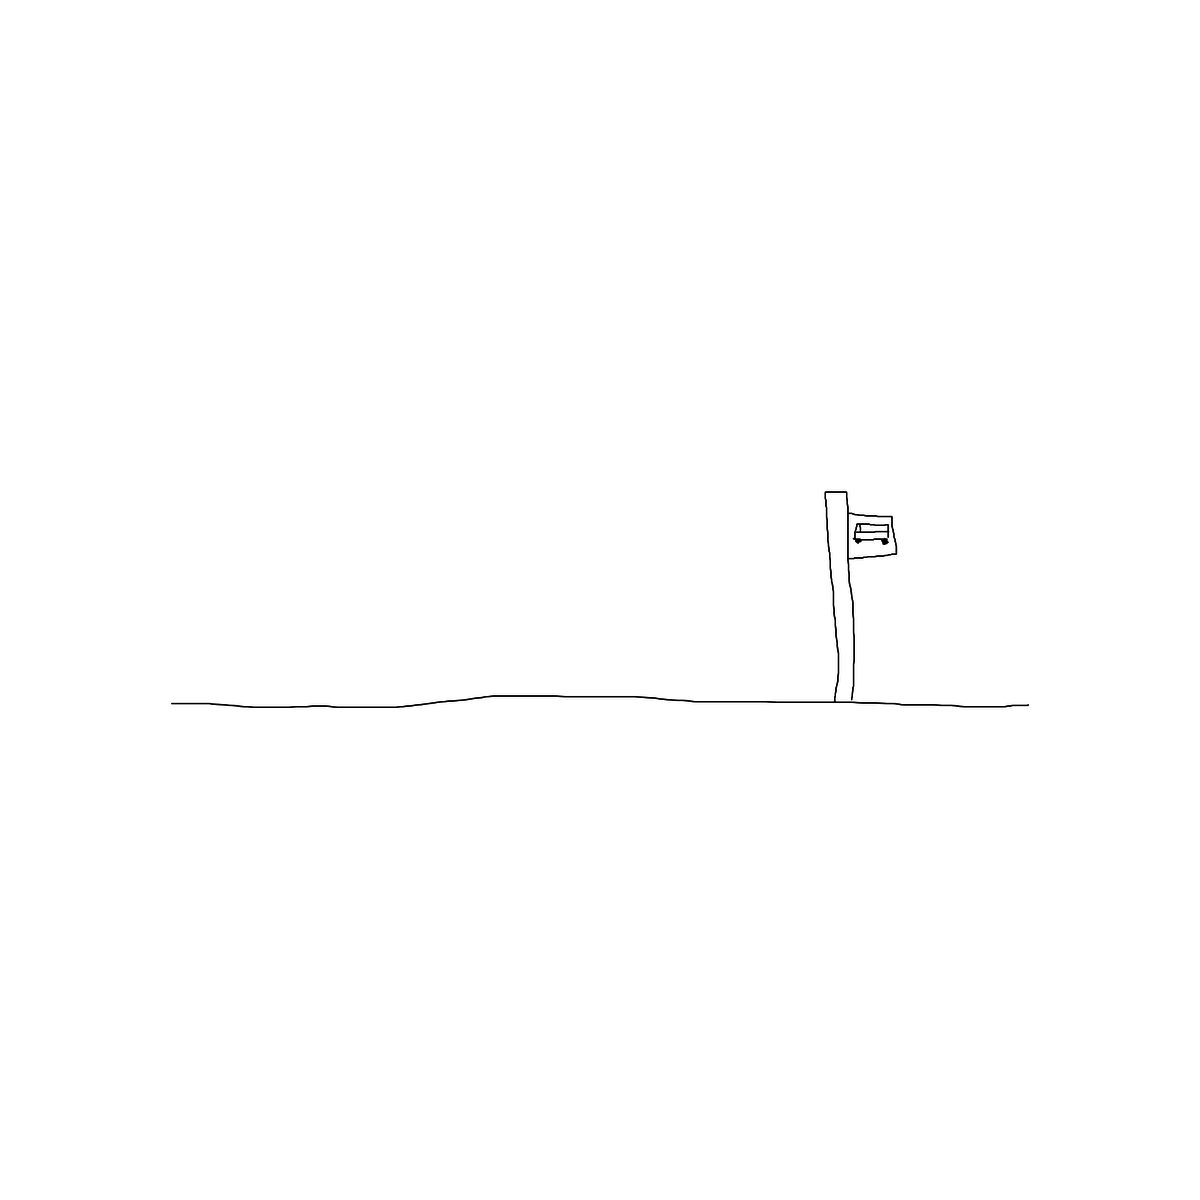 BAAAM drawing#1756 lat:46.3232574462890600lng: -79.4871978759765600